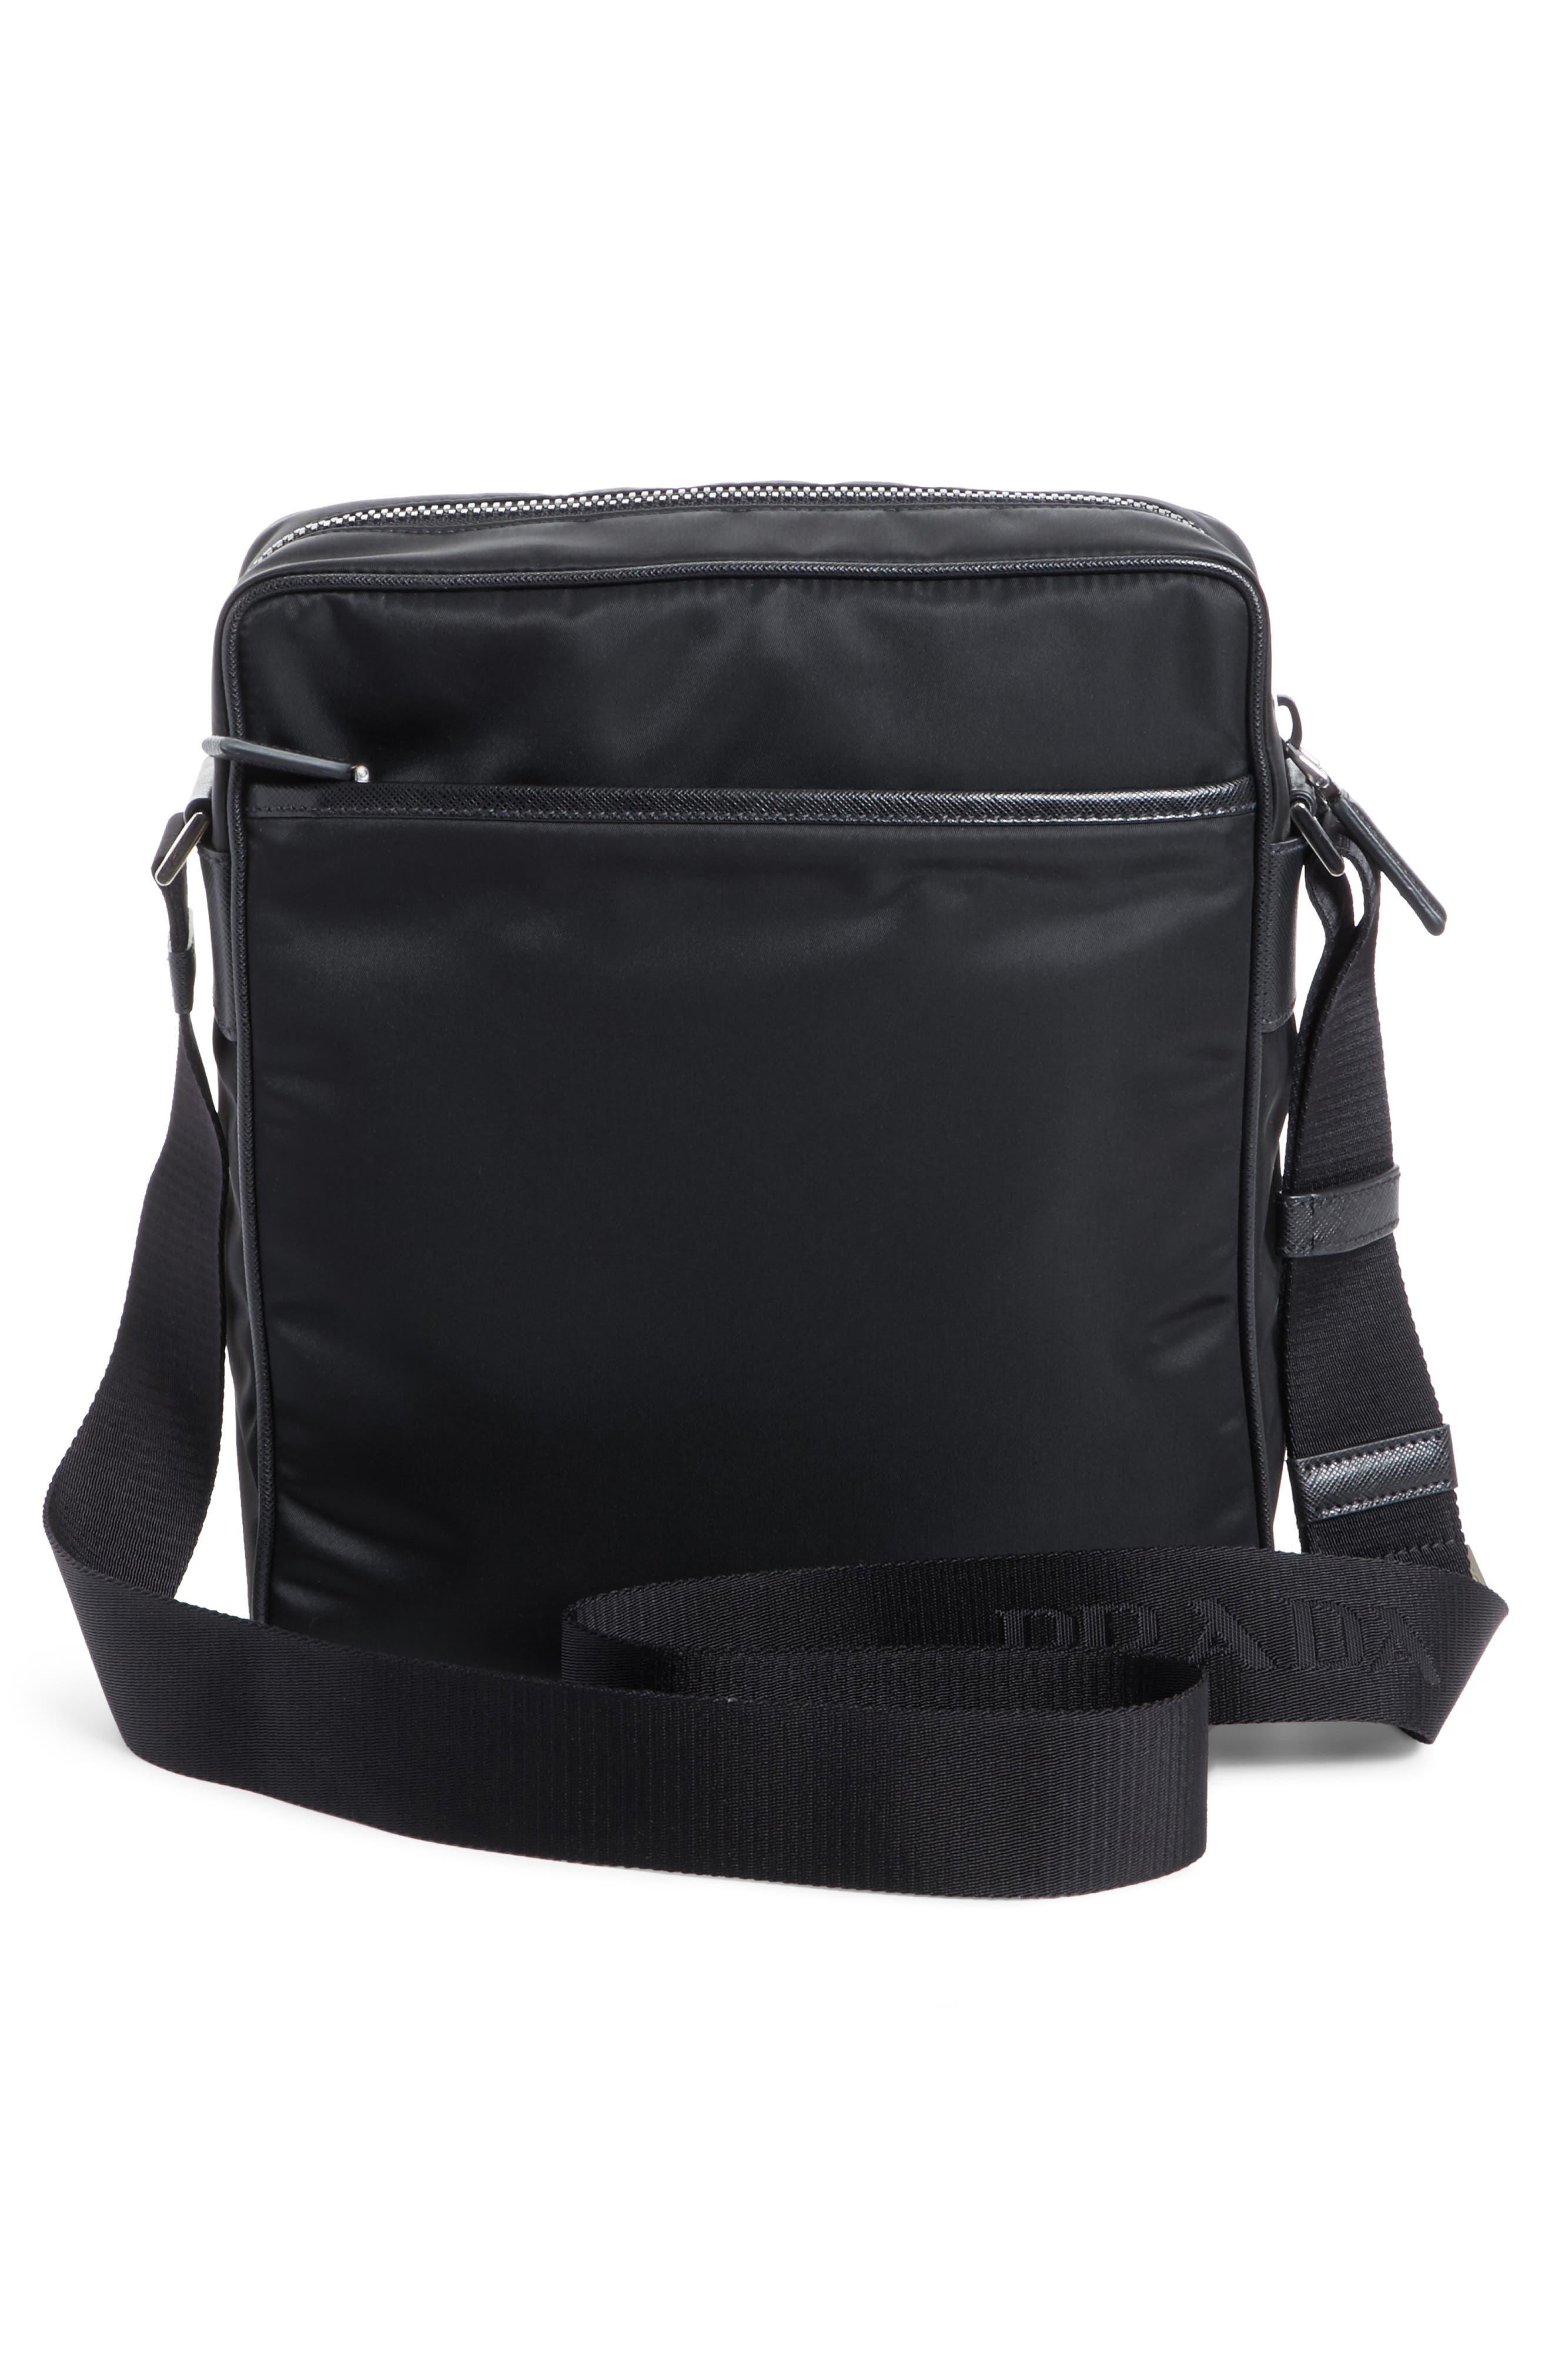 Saffiano Leather Crossbody Bag,                             Alternate thumbnail 5, color,                             Nero